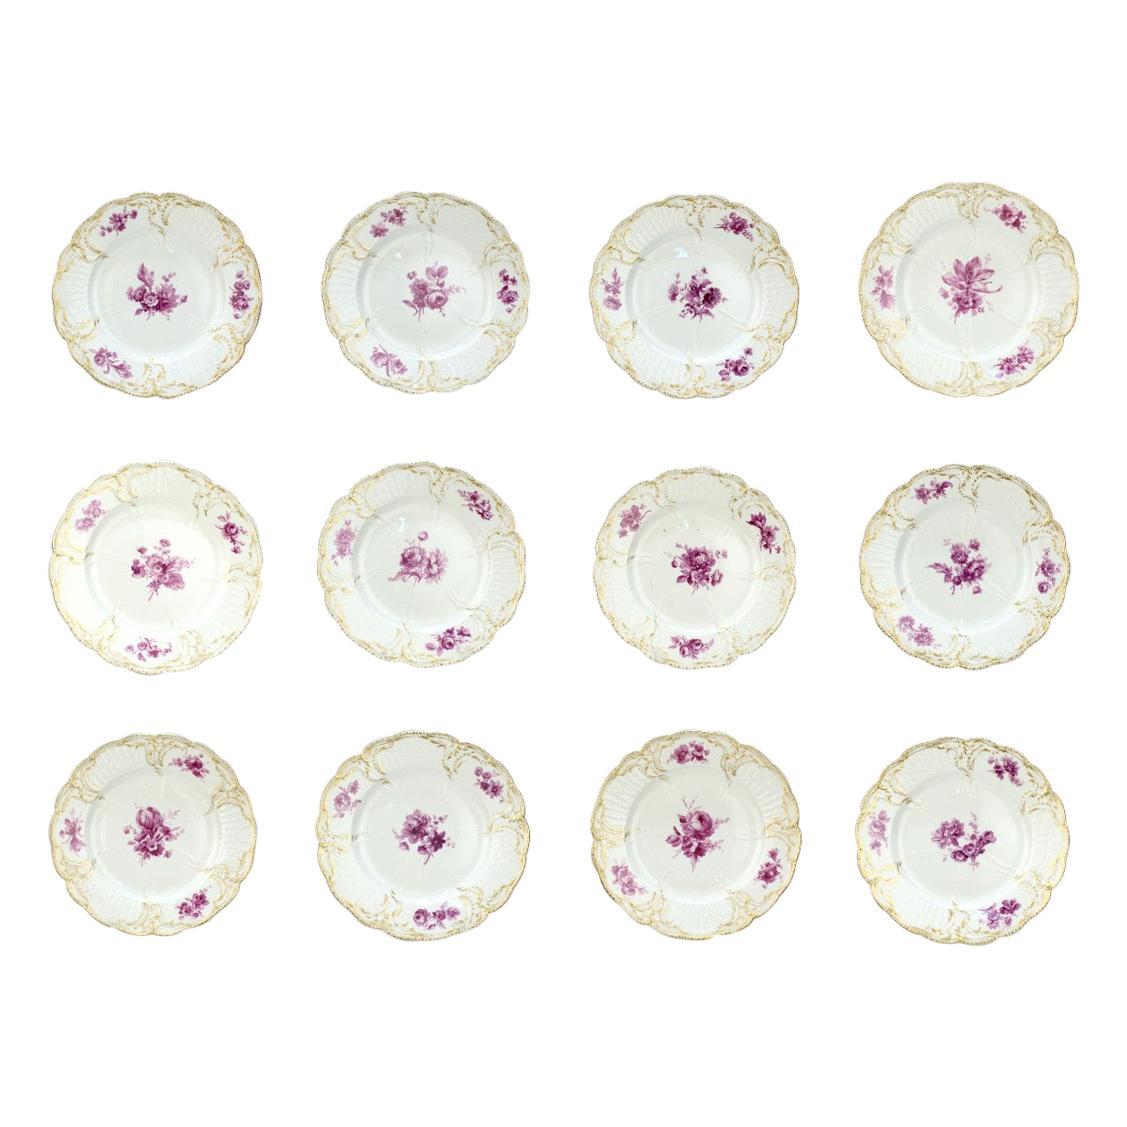 Set of 12 Antique KPM Royal Berlin Porcelain Reliefzierat Dinner Plates in Puce